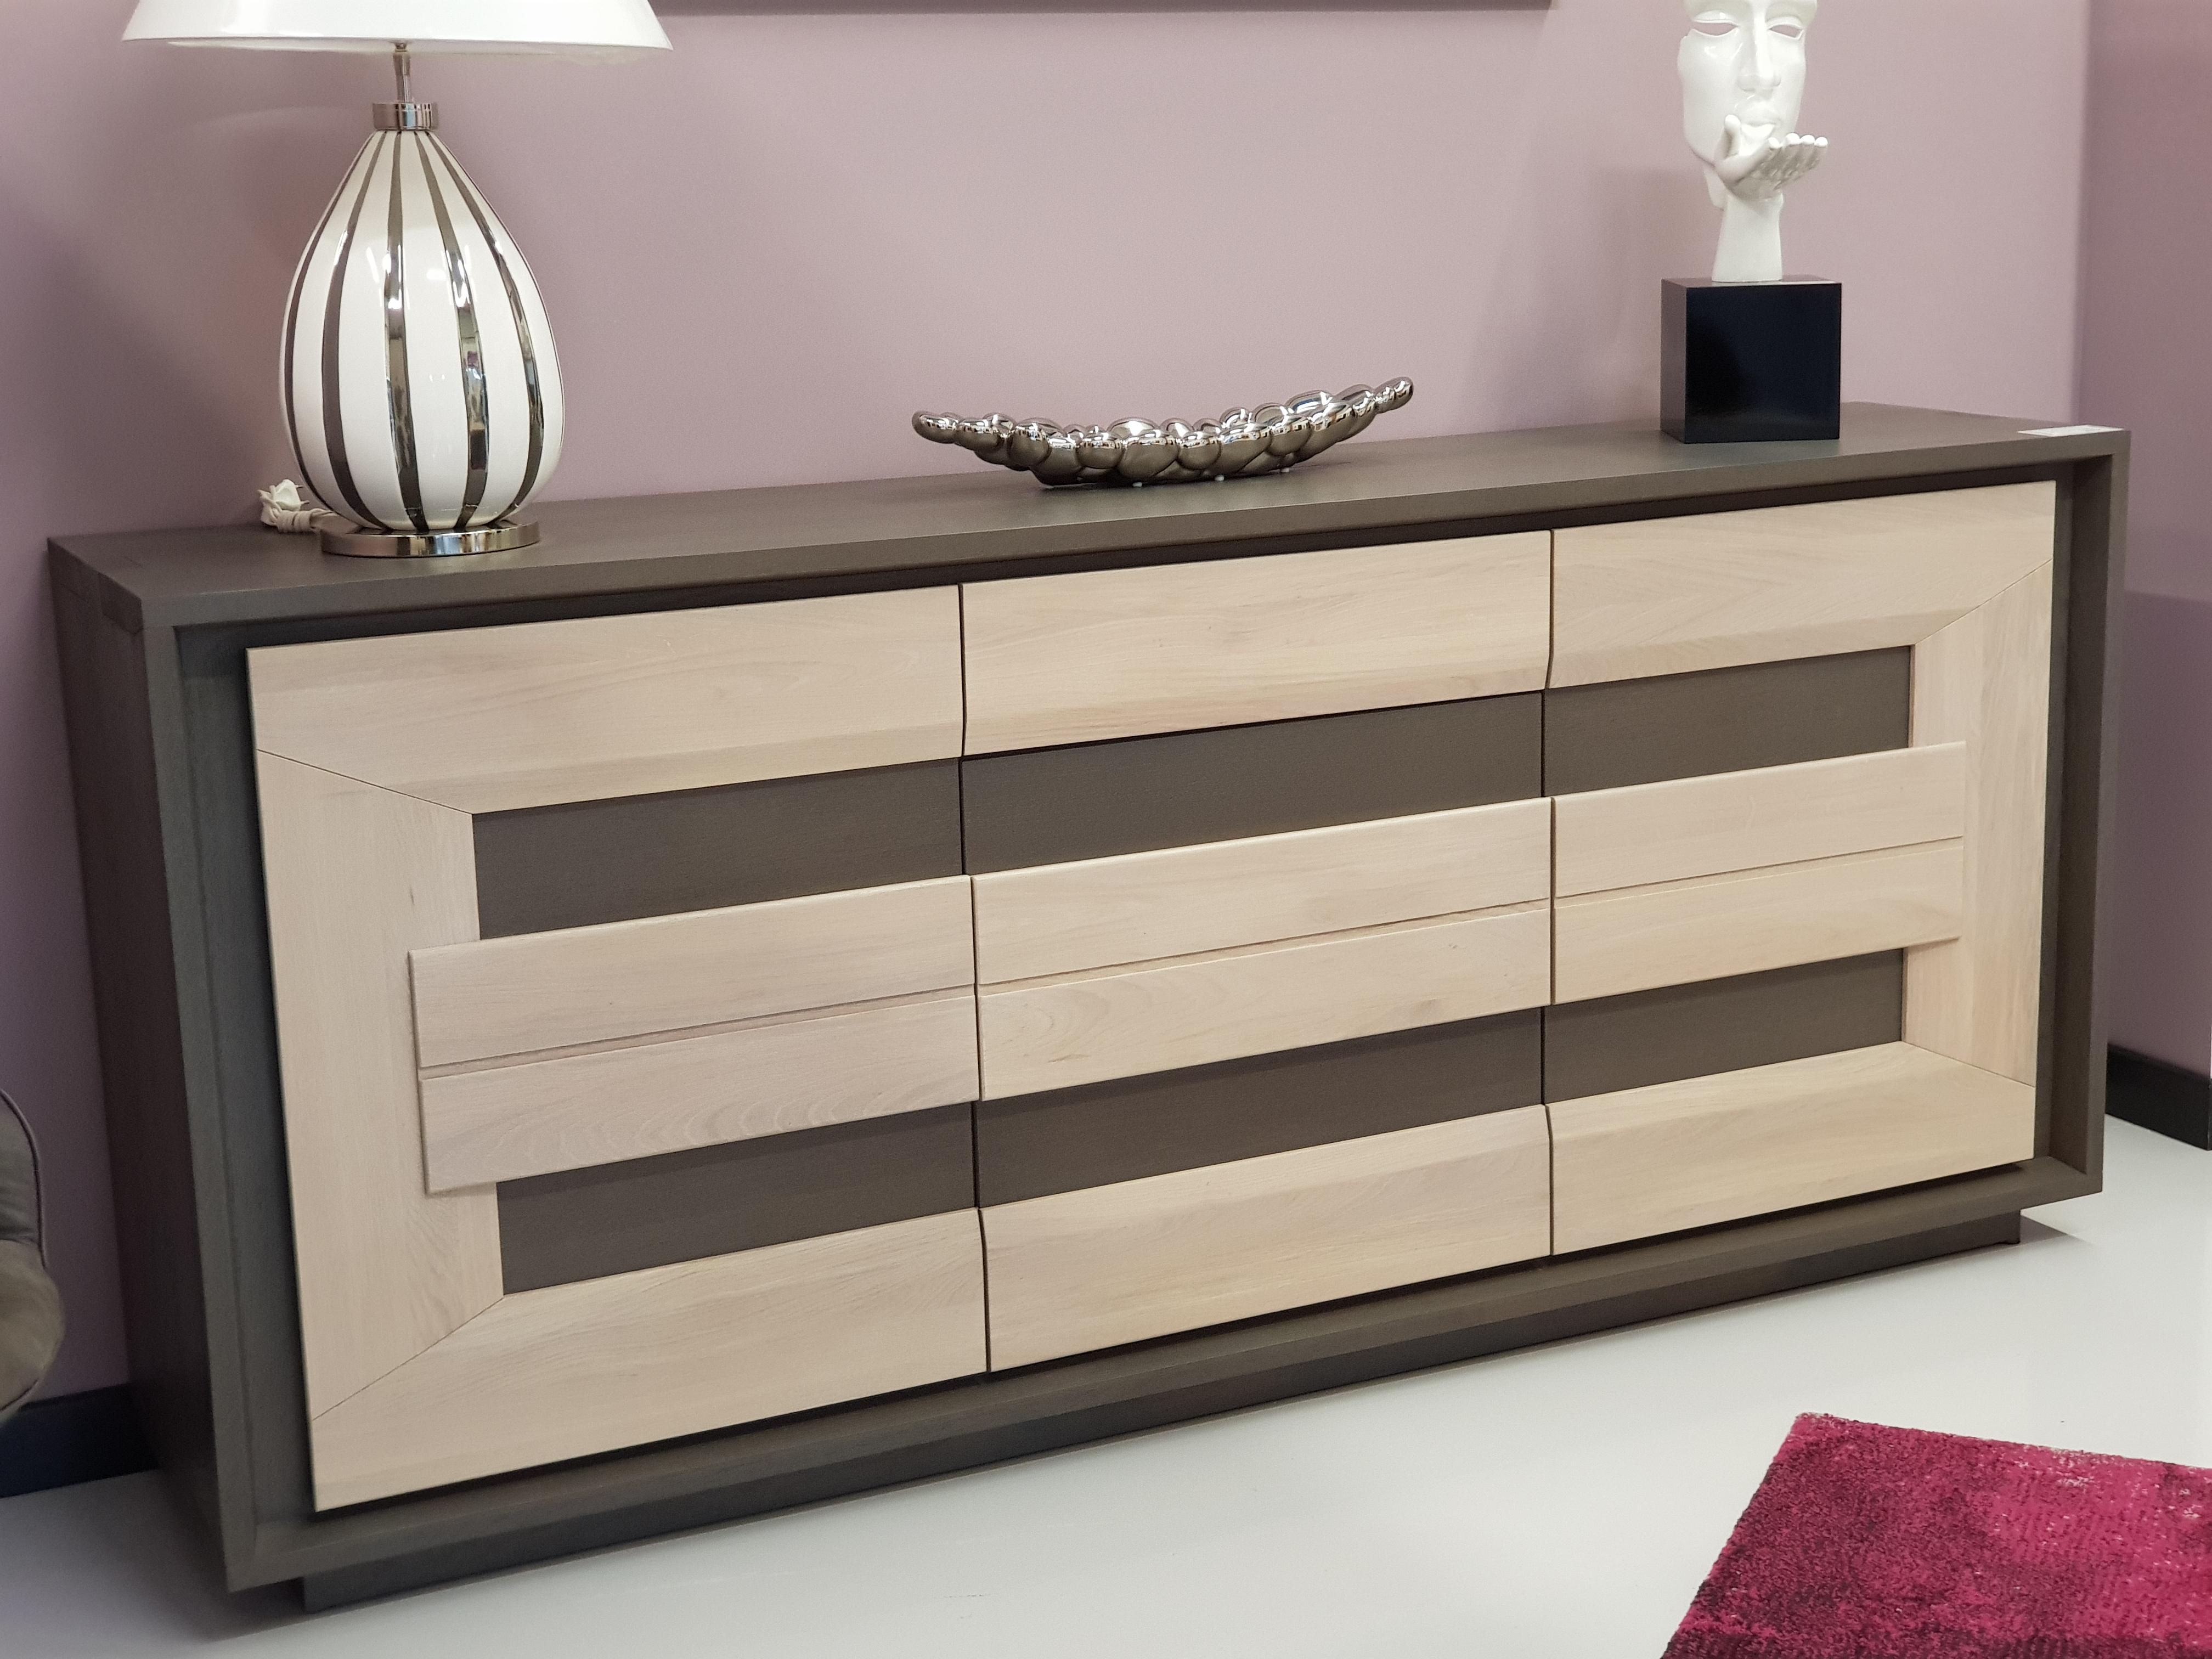 meuble bas en ch ne massif disponible prix sp cial. Black Bedroom Furniture Sets. Home Design Ideas